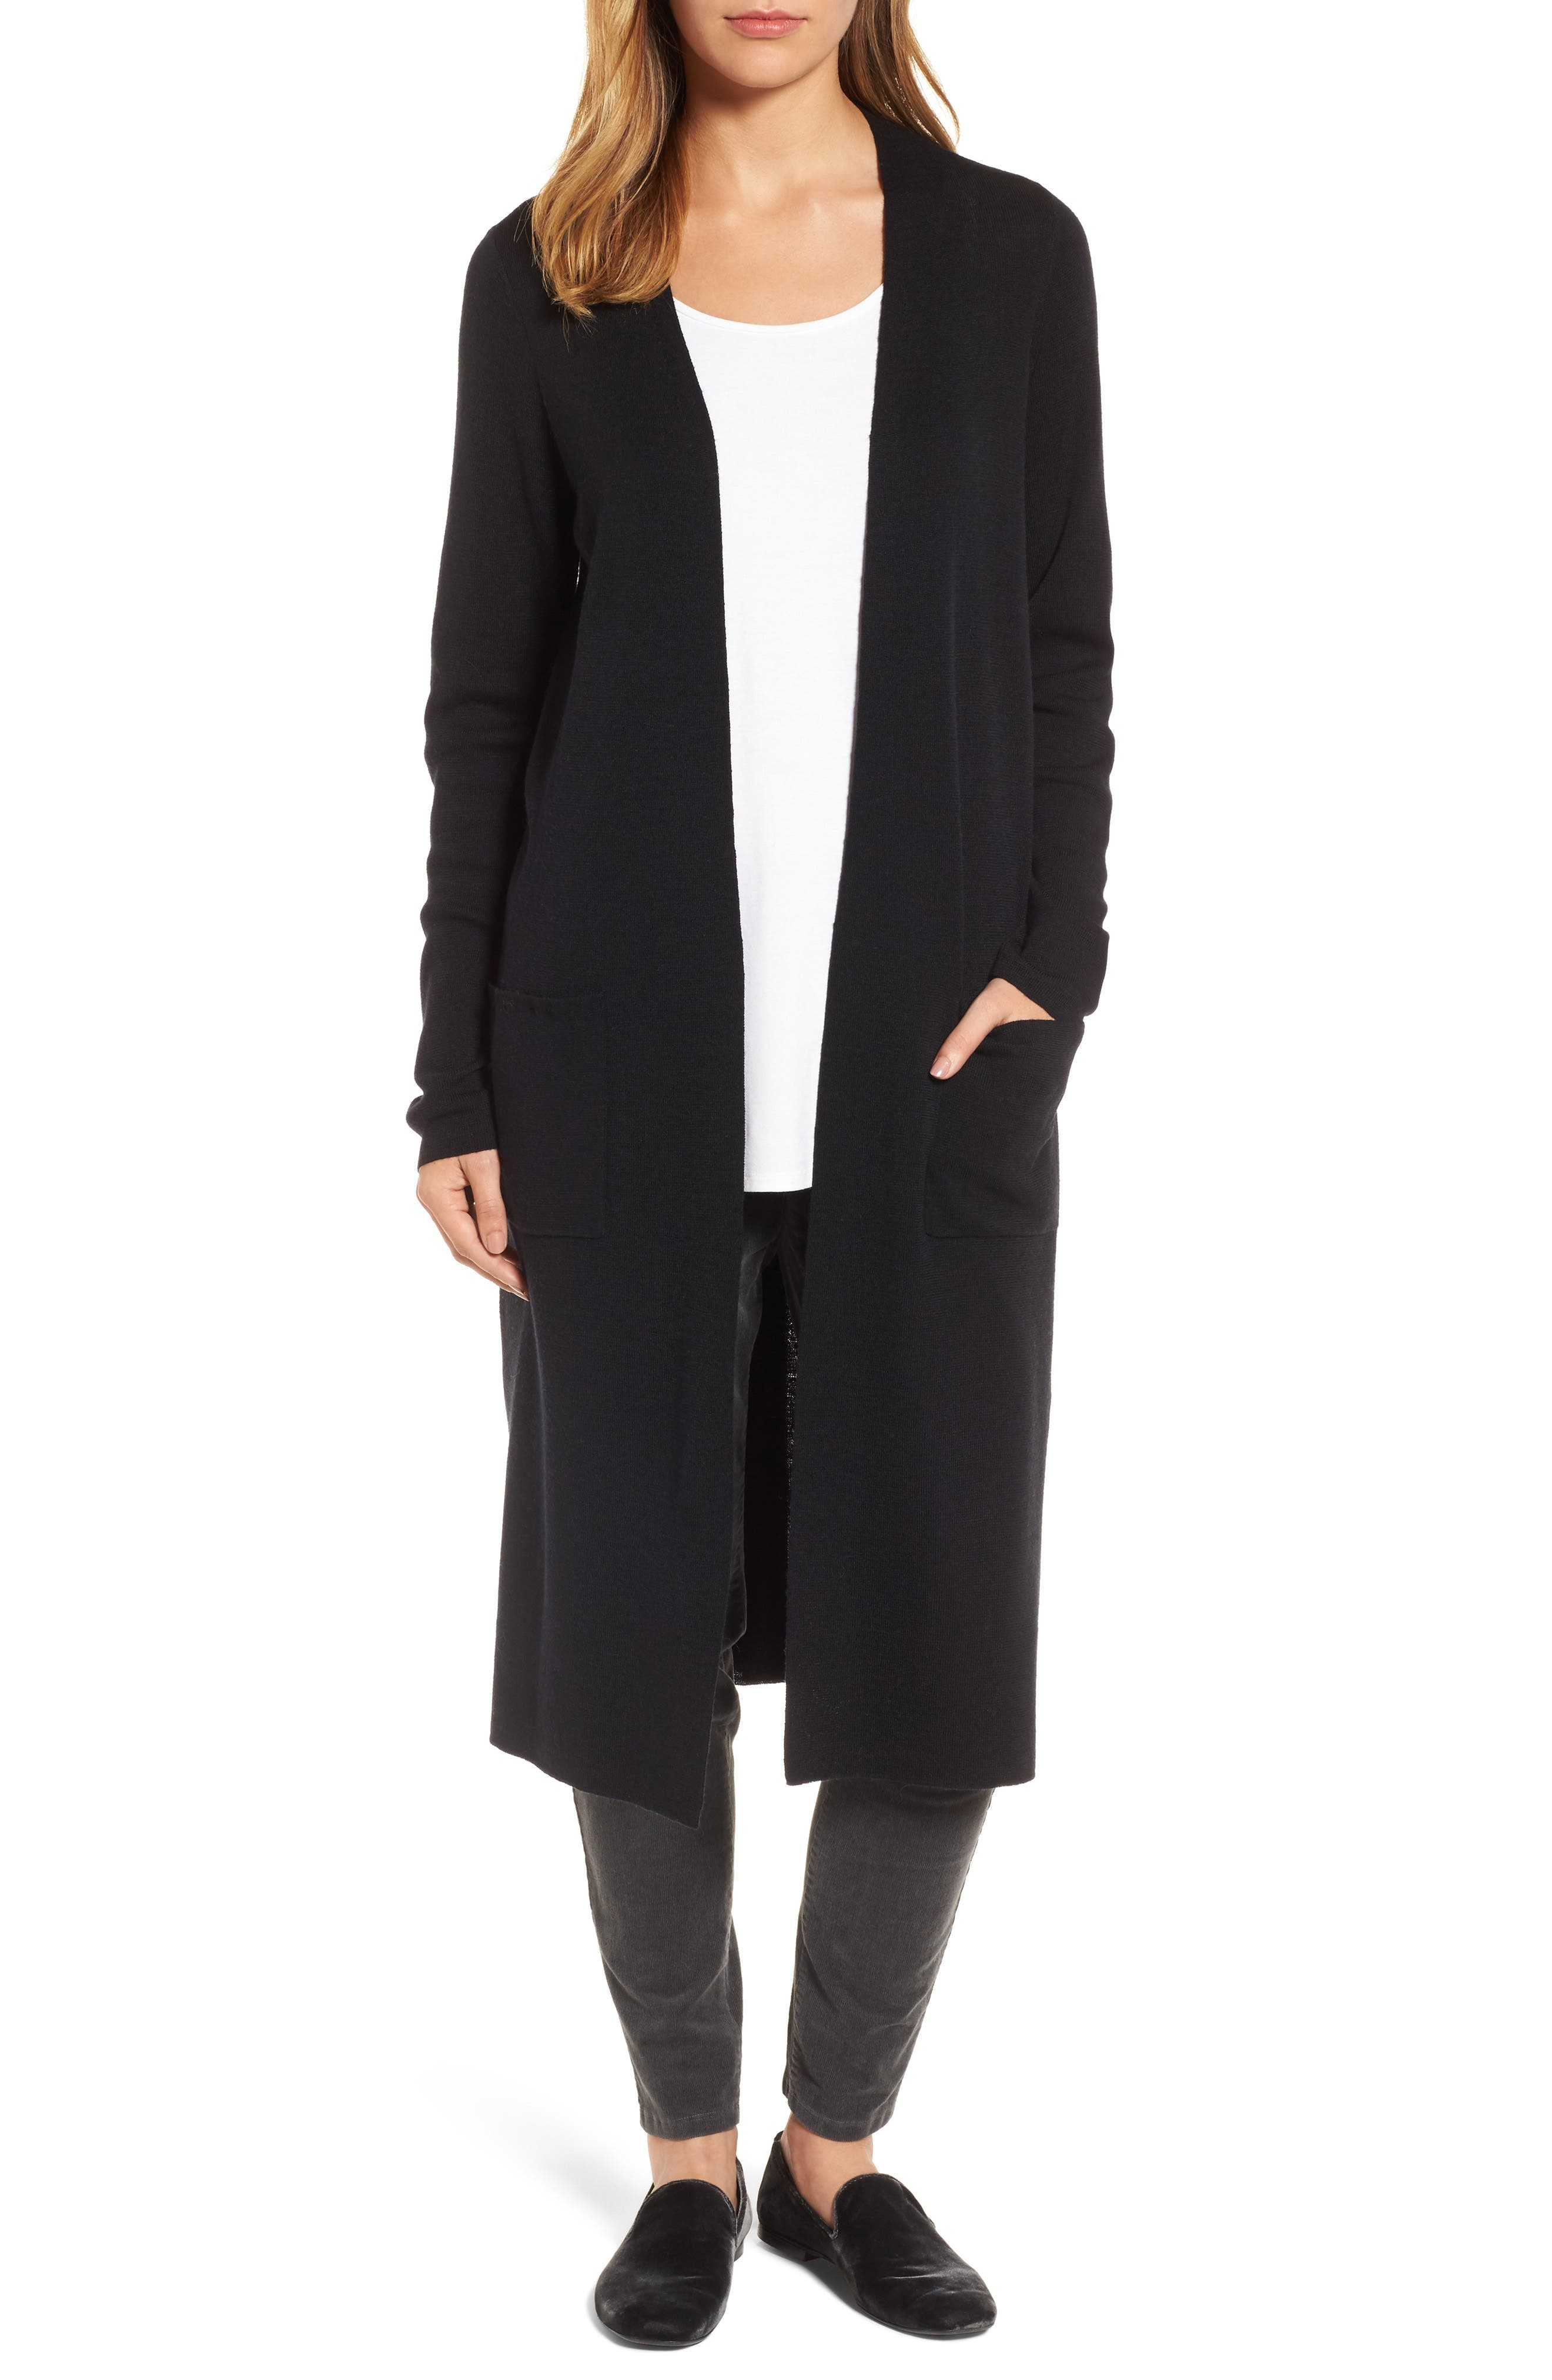 Alternate Image 1 Selected - Eileen Fisher Long Merino Wool Cardigan (Regular & Petite)